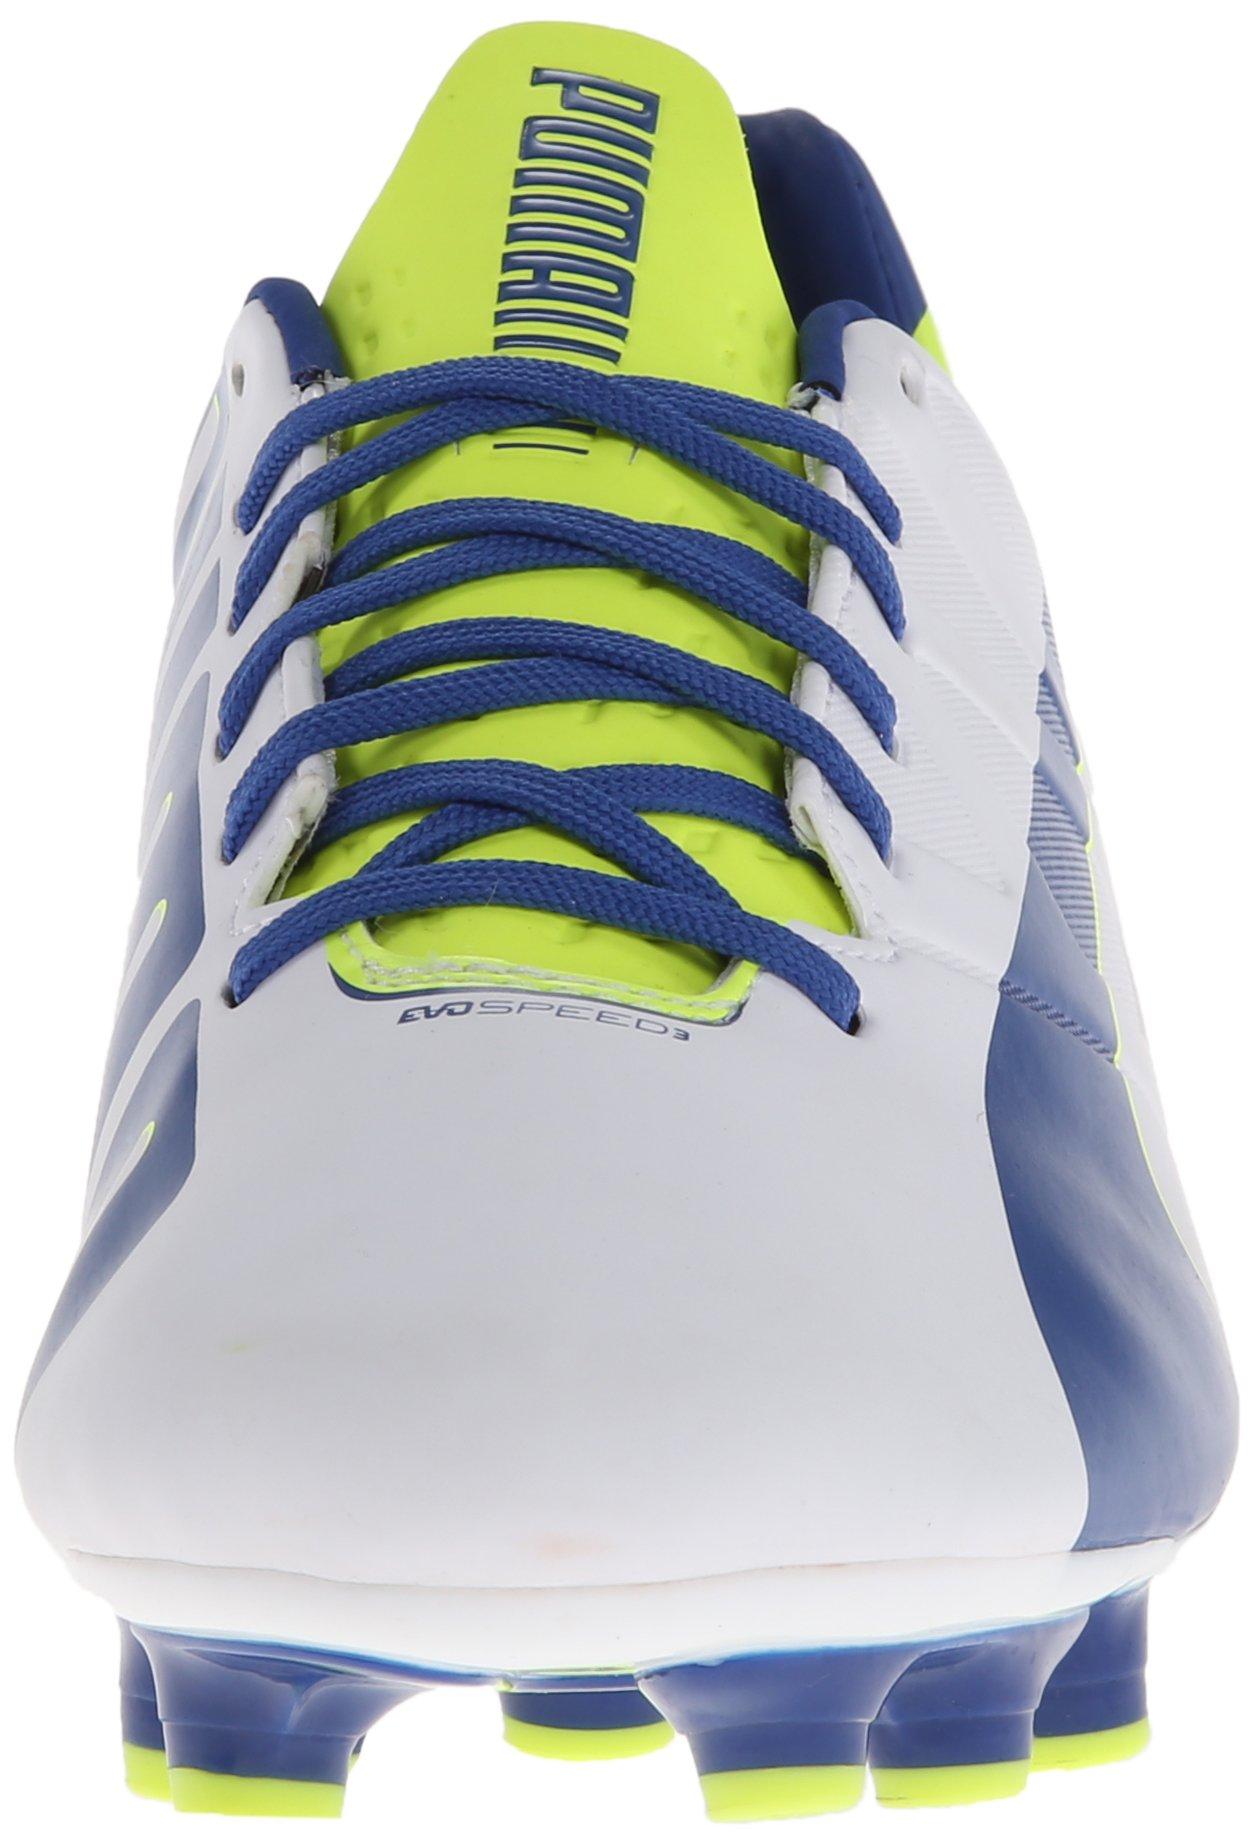 PUMA Women's Evo Speed 3.3 Firm Ground Soccer Shoe,White/Snorkel Blue/Fluorescent Yellow,8 B US by PUMA (Image #4)